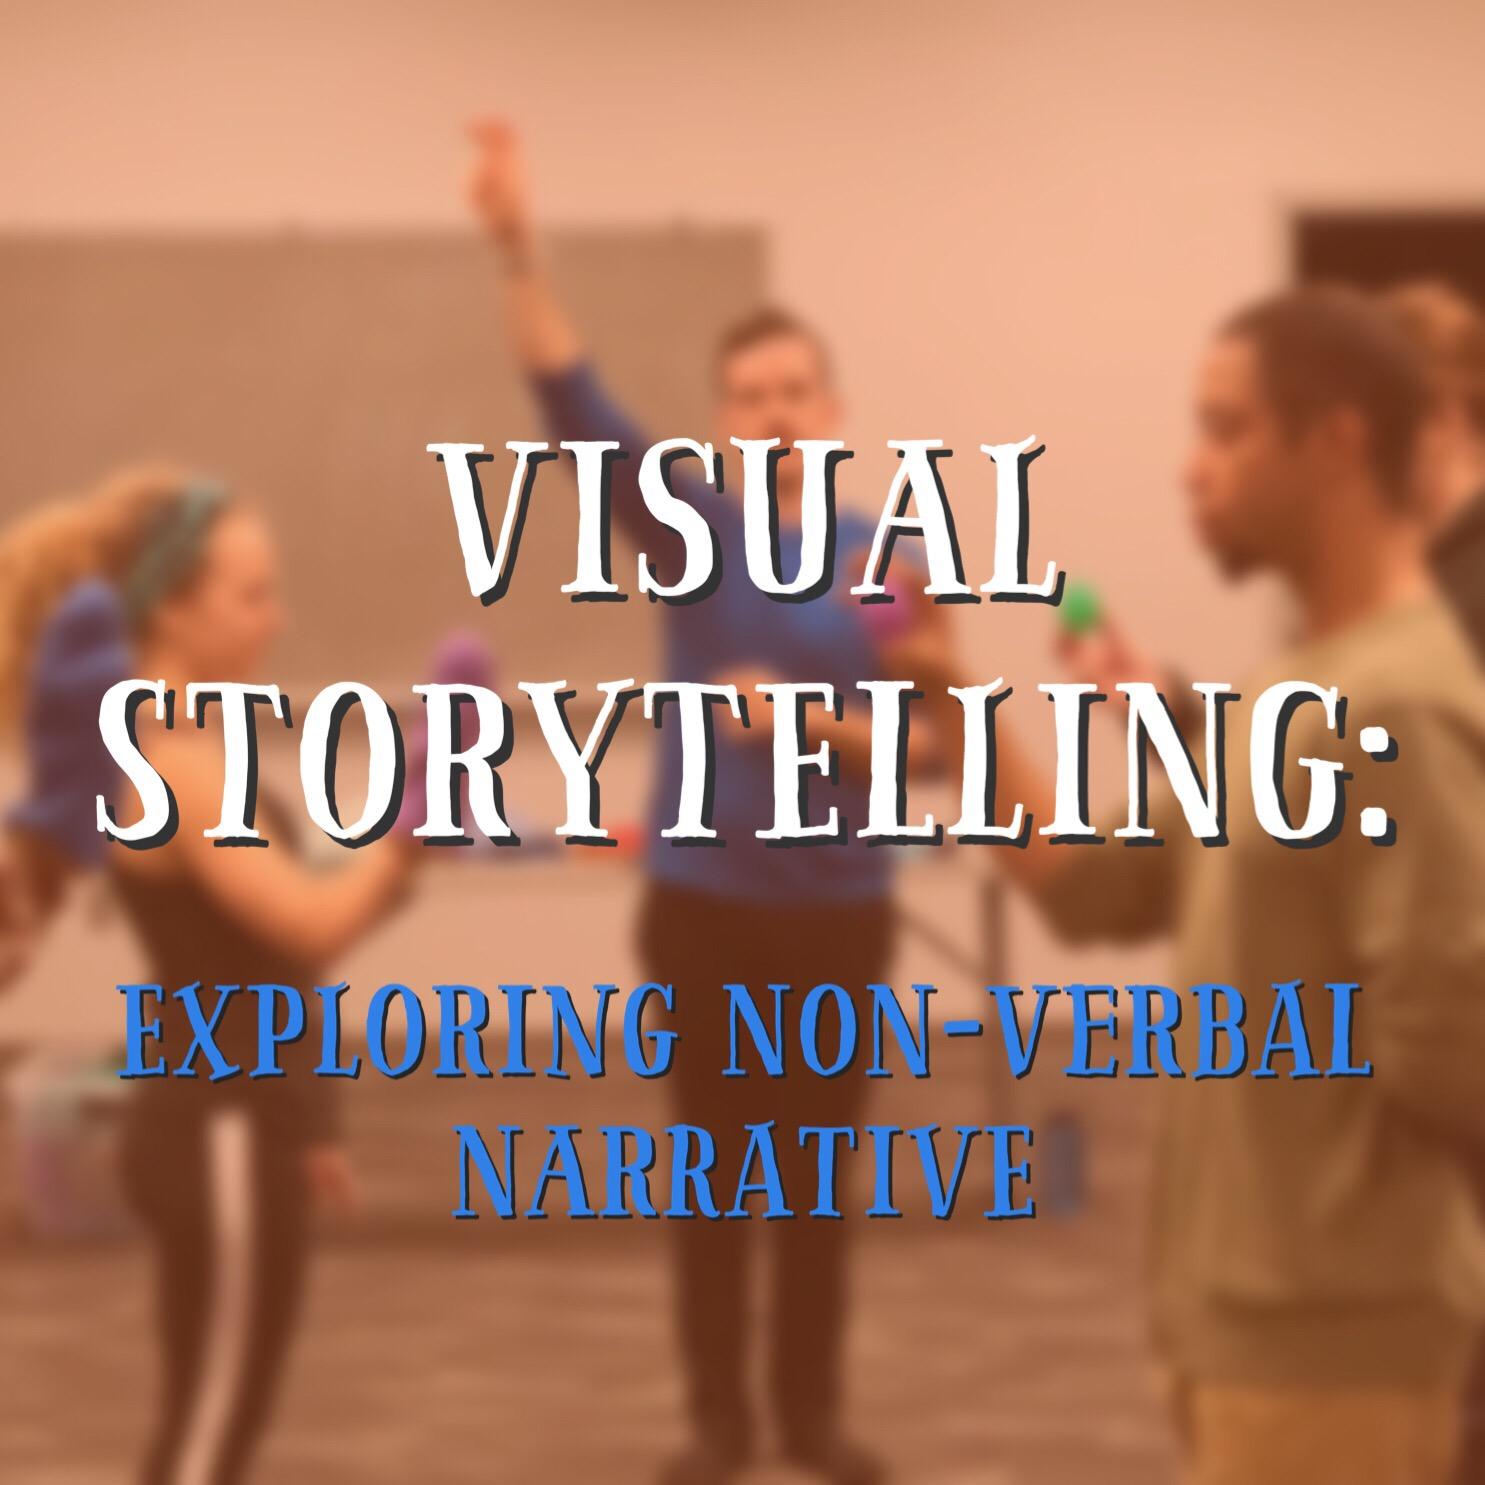 VisualStorytelling.jpg